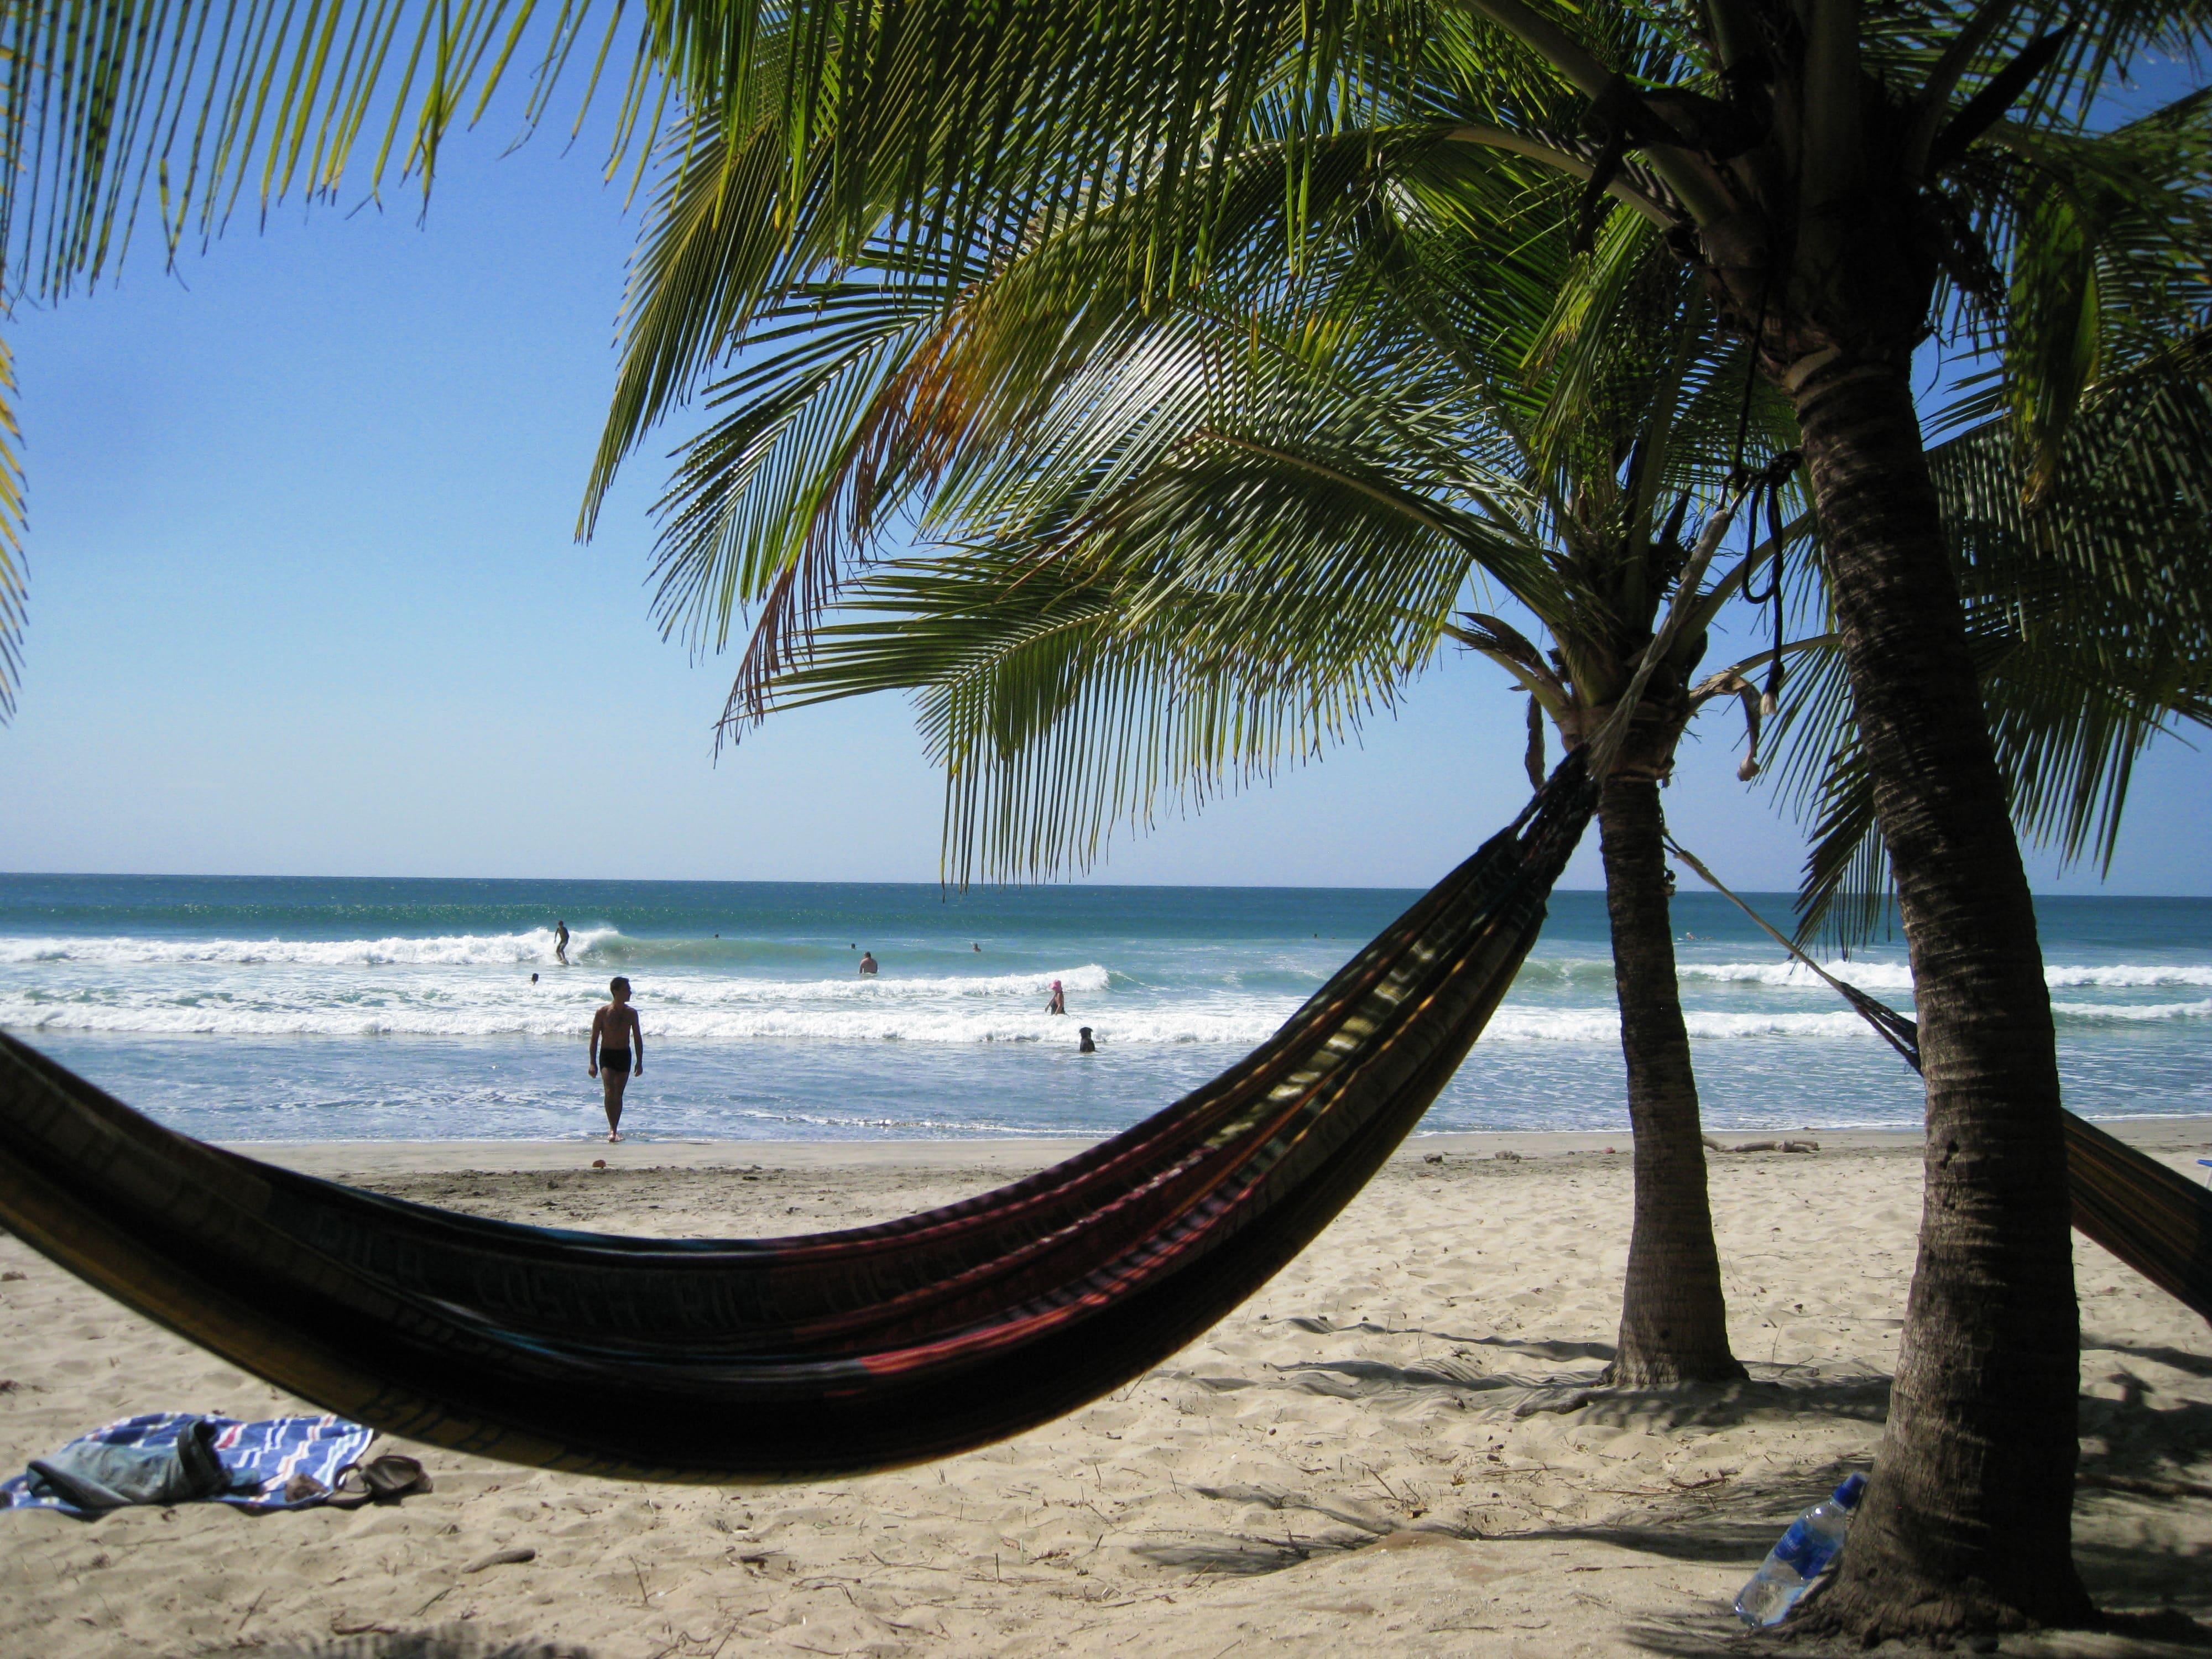 christmas travel deals 6 days costa rica guide group tour arenal volcano and tamarindo beach  rh   costaricagreenadventures